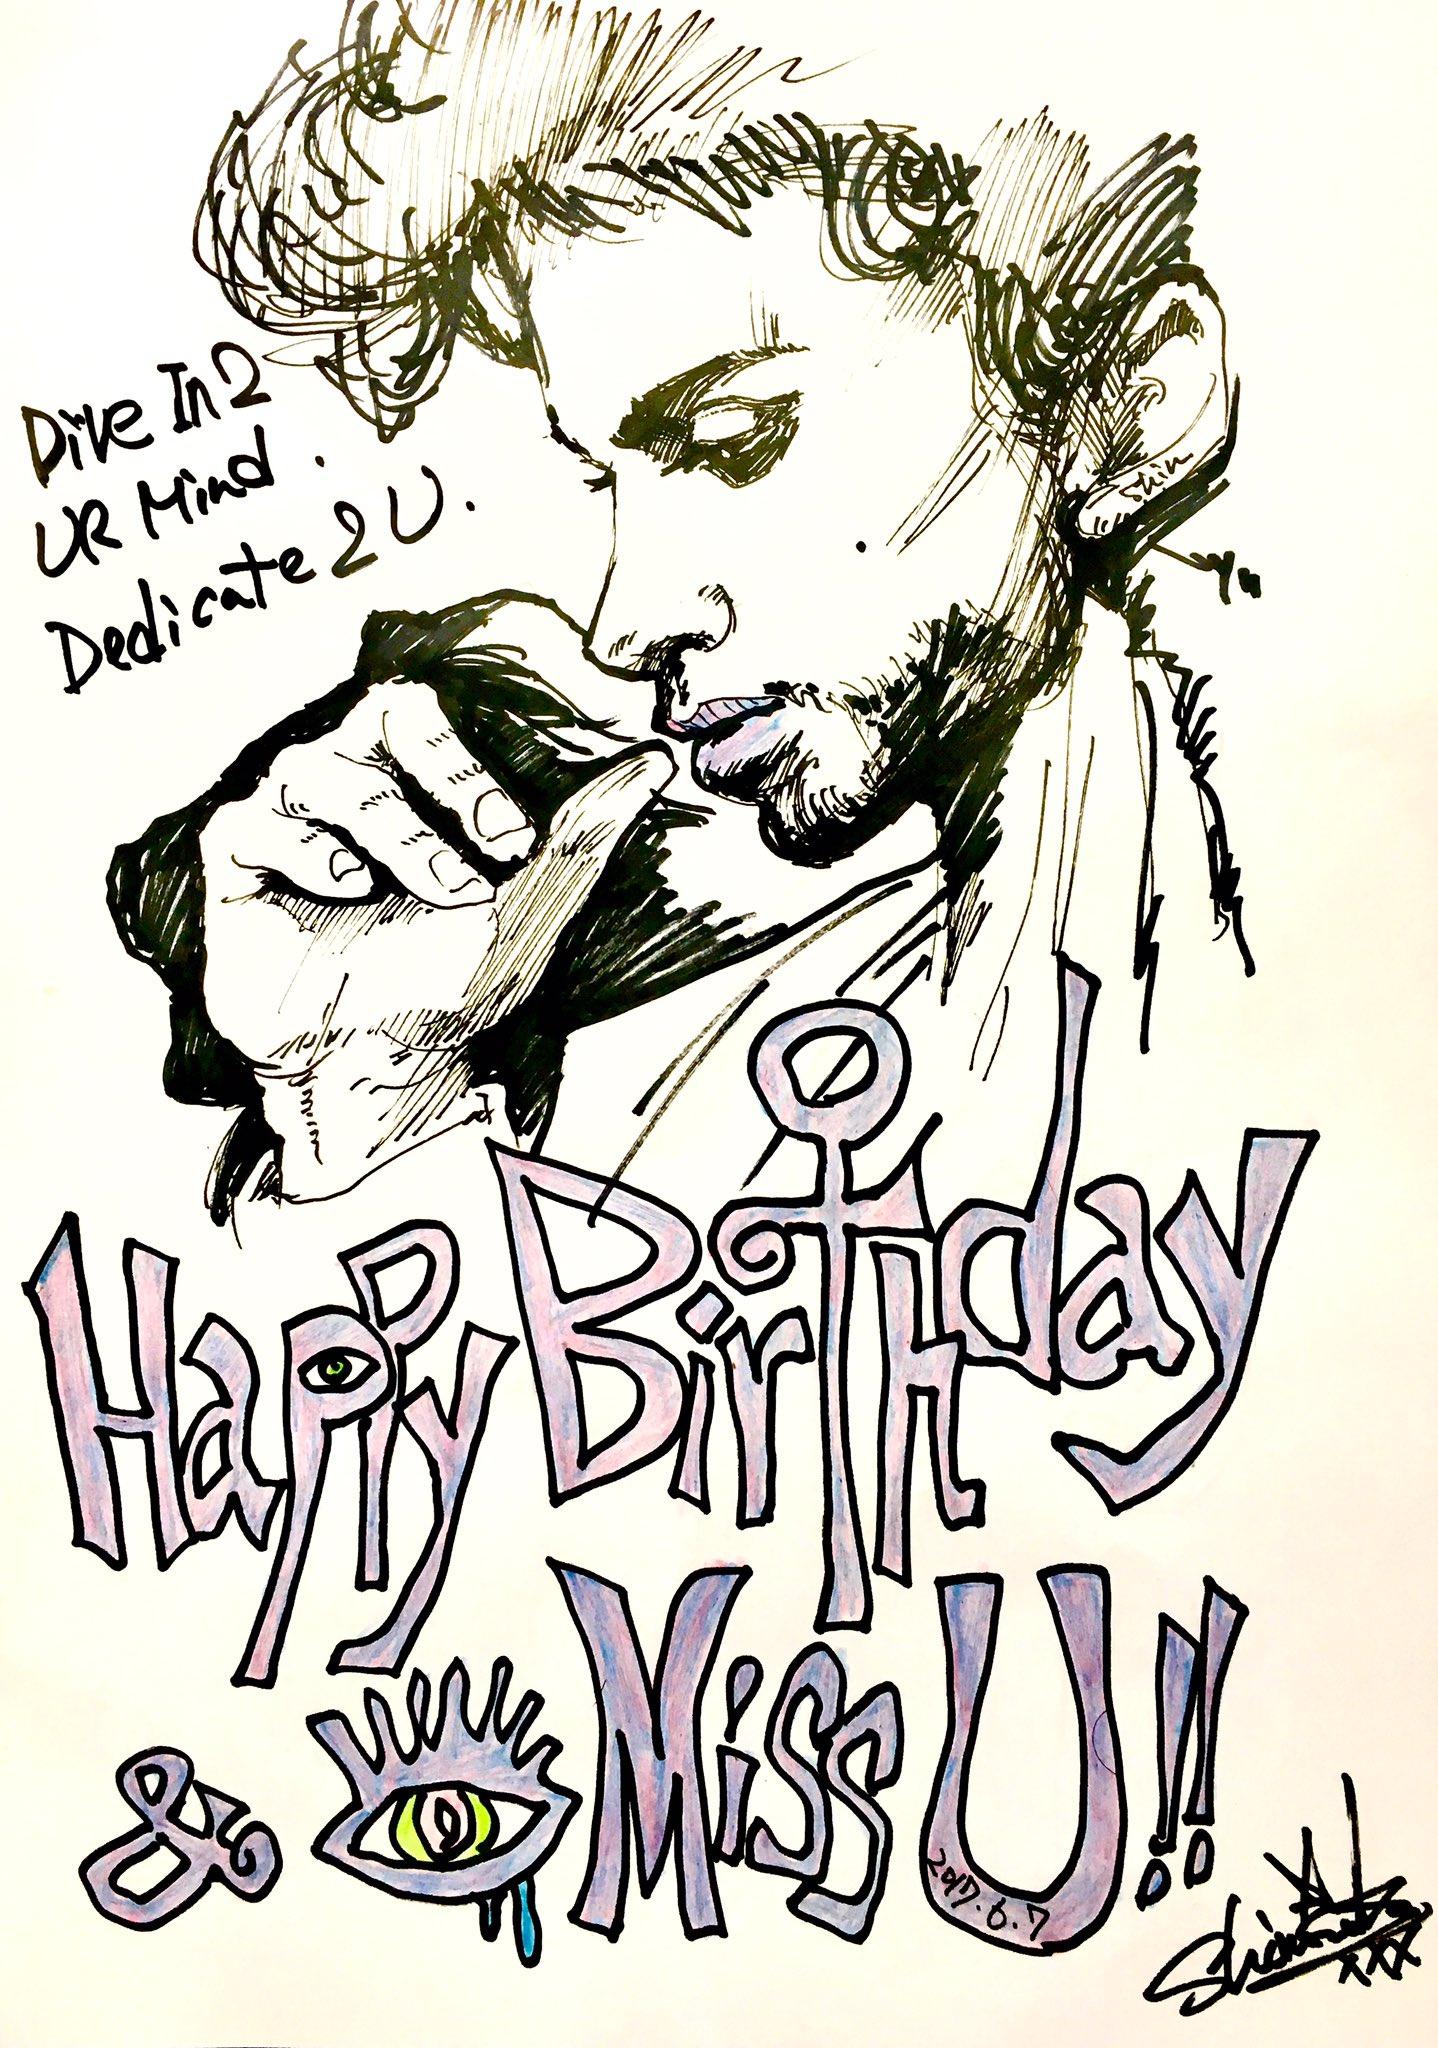 Happy Birthday & Miss U !!